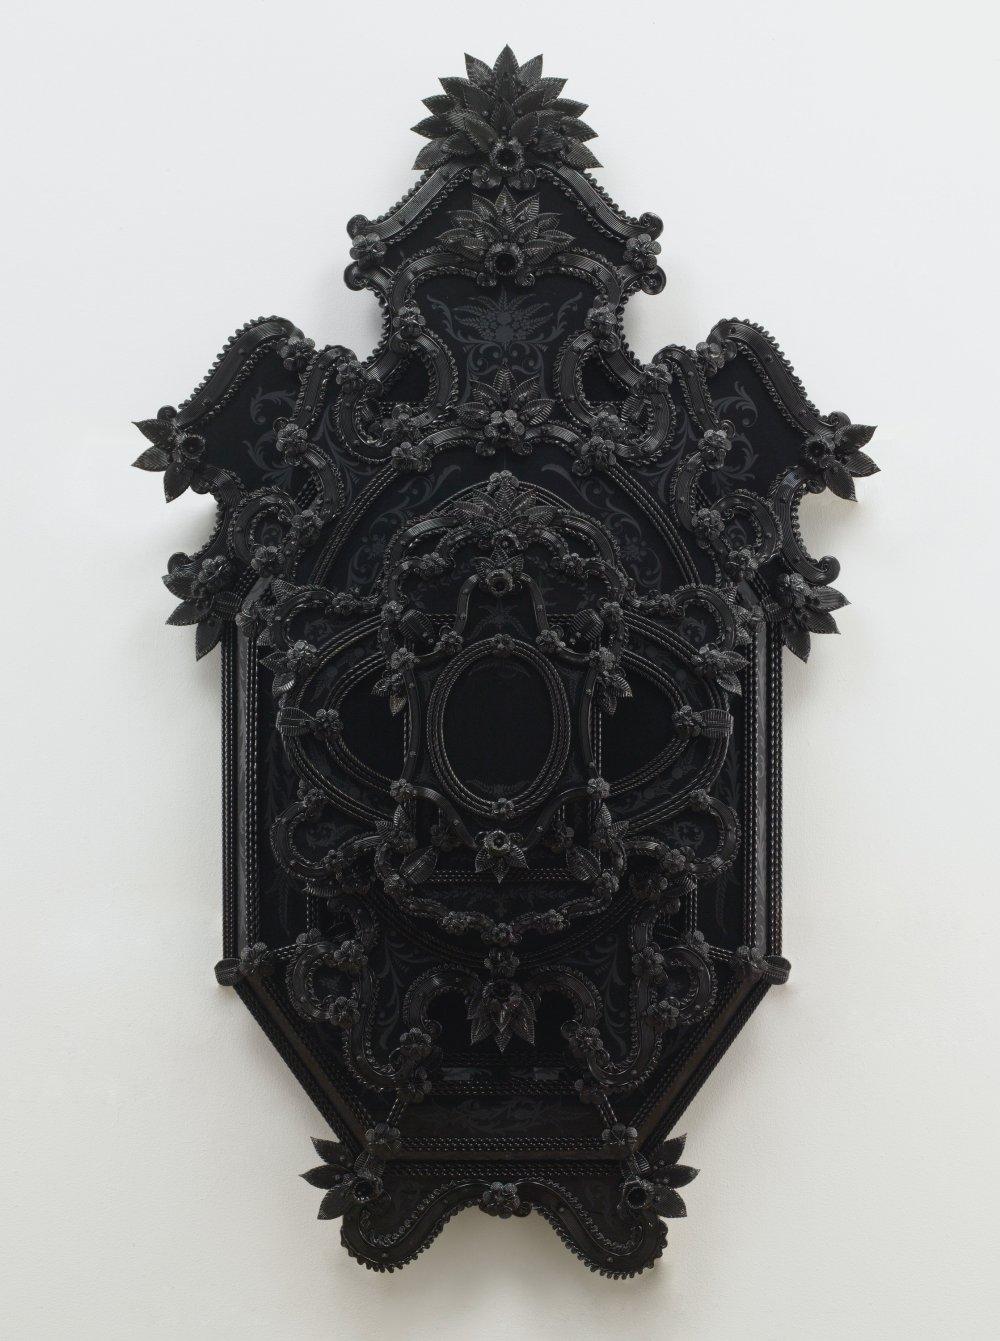 Emilia's Mirror - Act 5, Scene 2